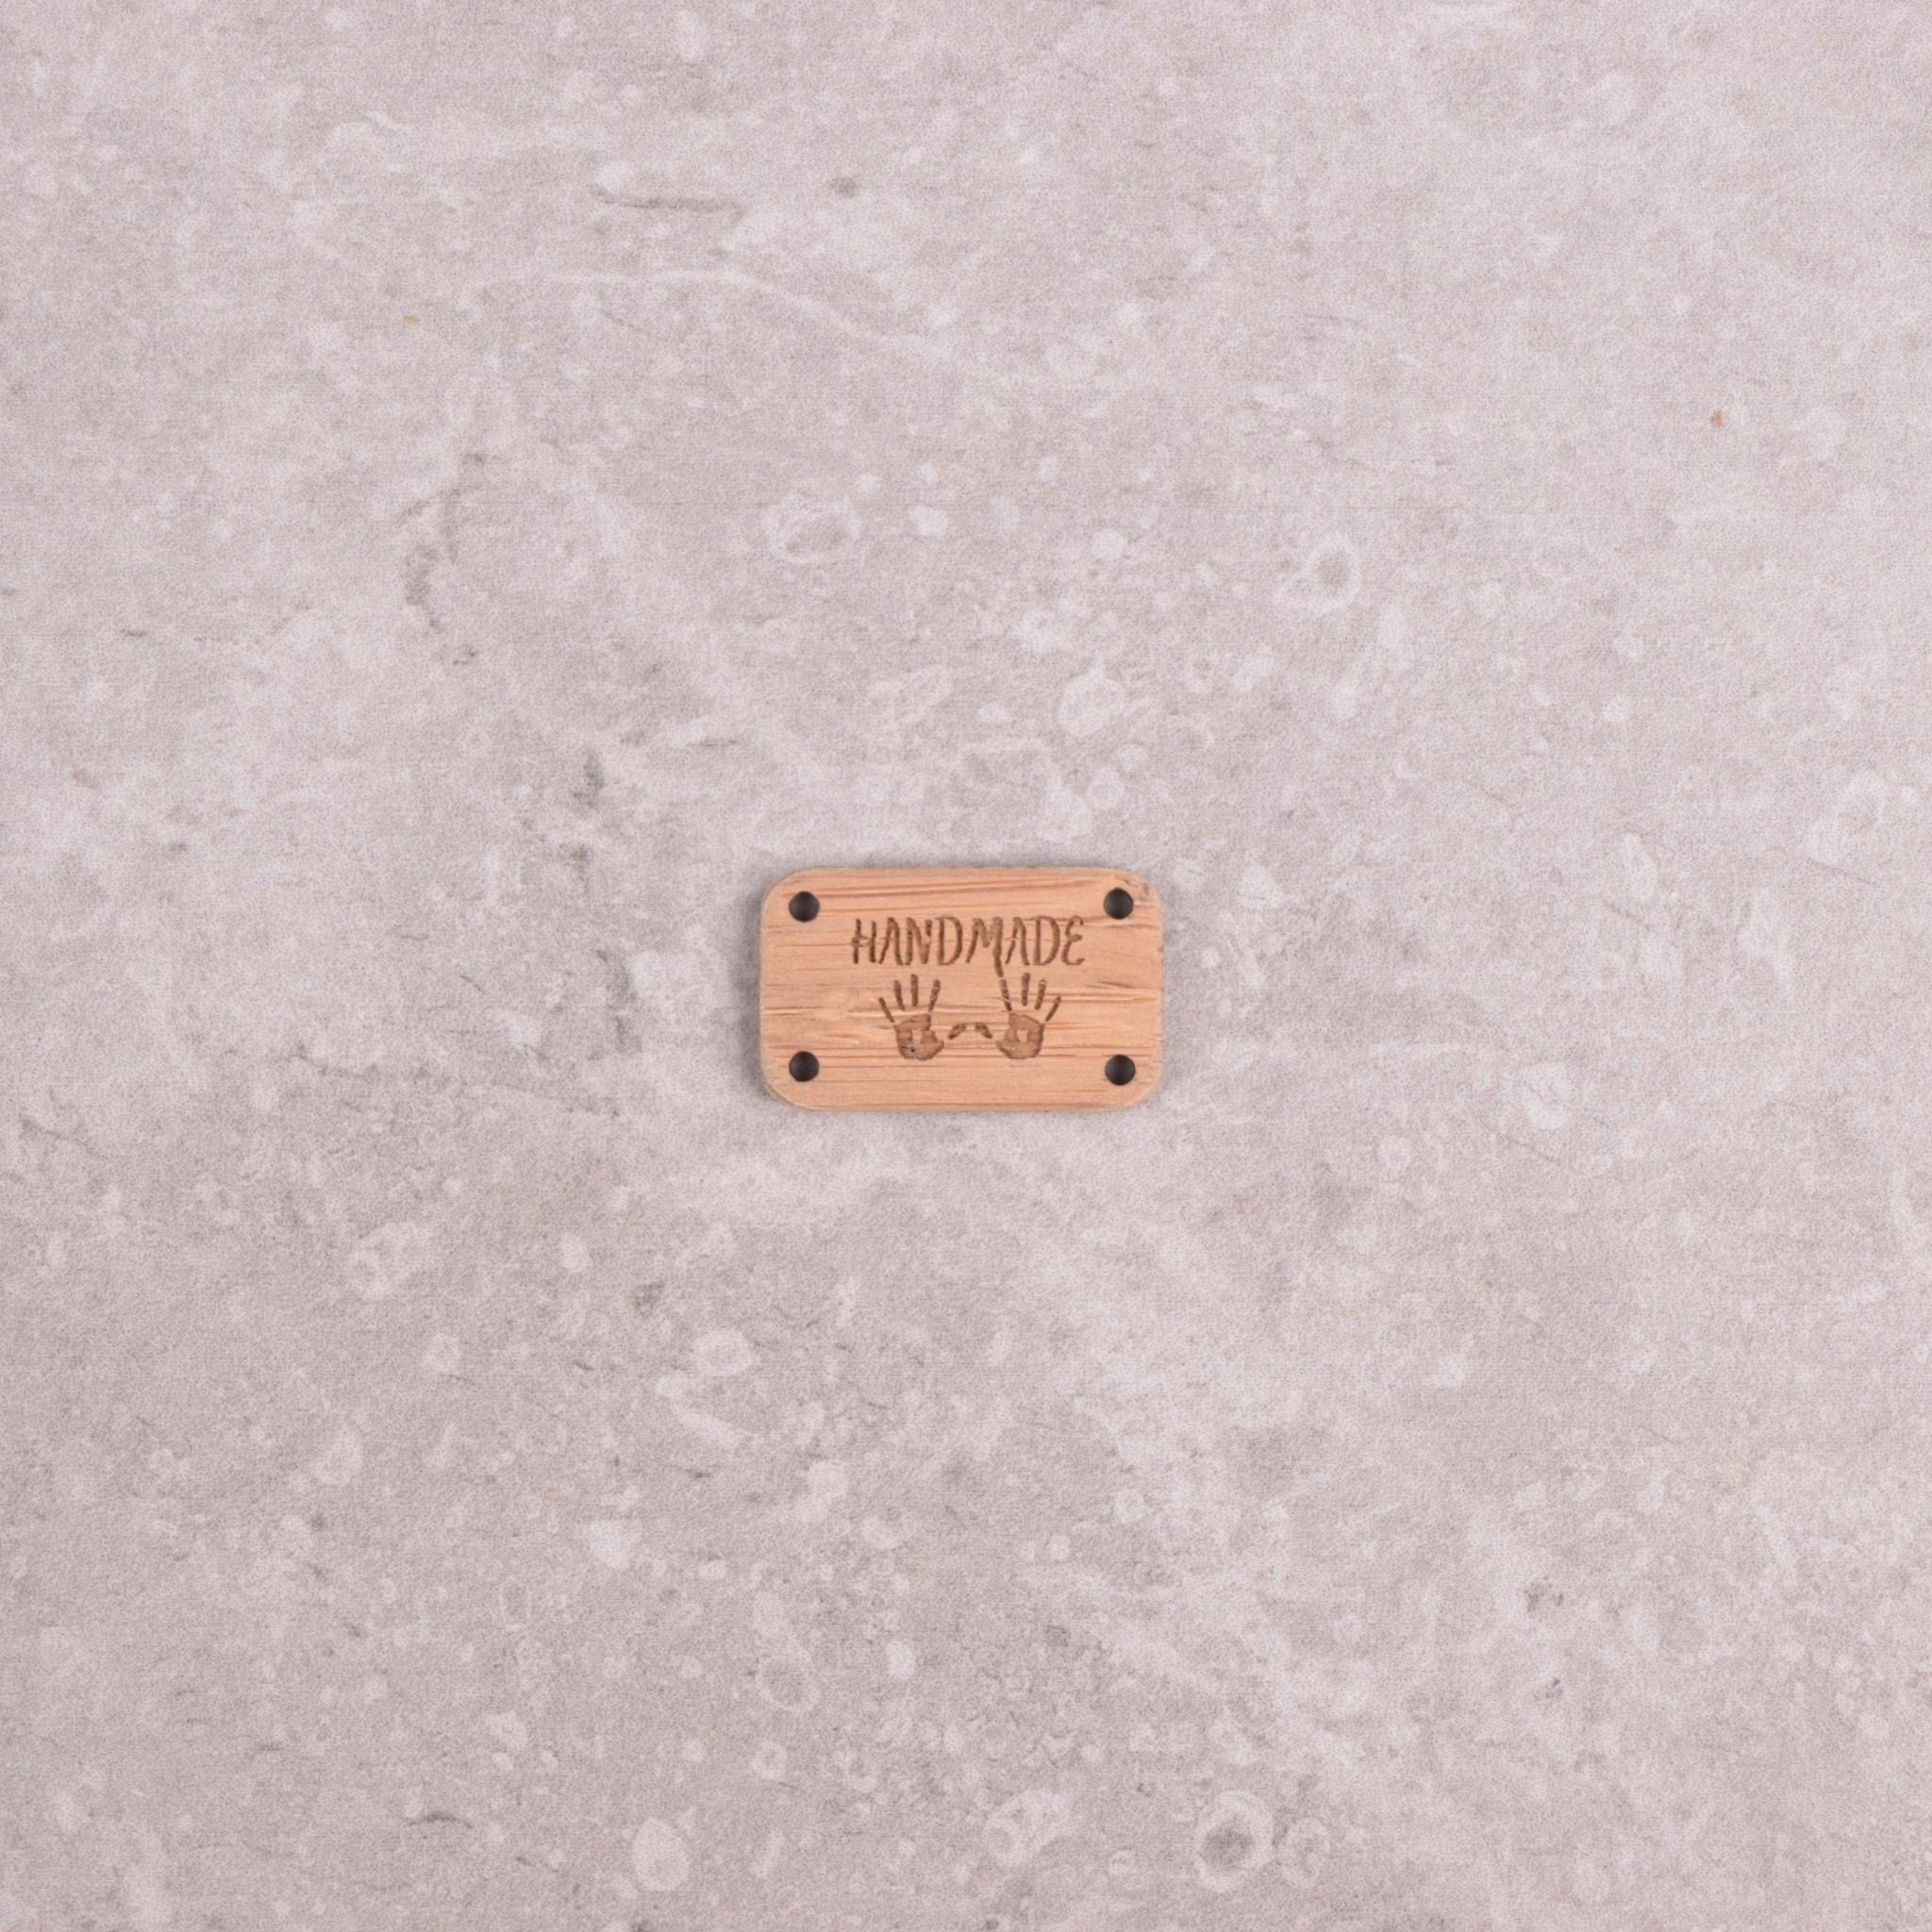 Image of Katrinkles Sew-on, Wood Hand Made Tag